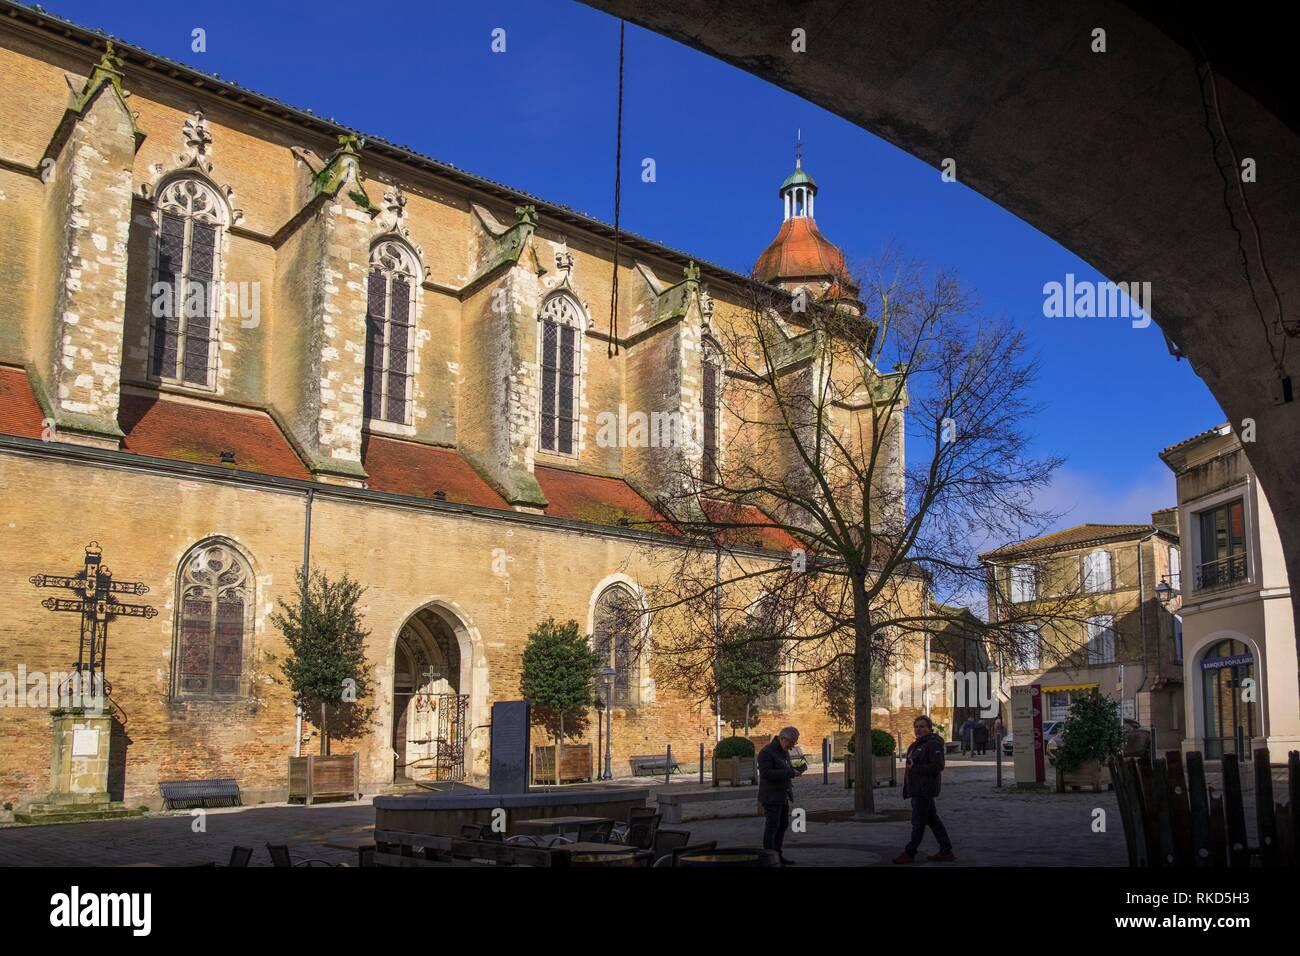 France, Occitanie, Gers, Parish church at Eauze. - Stock Image